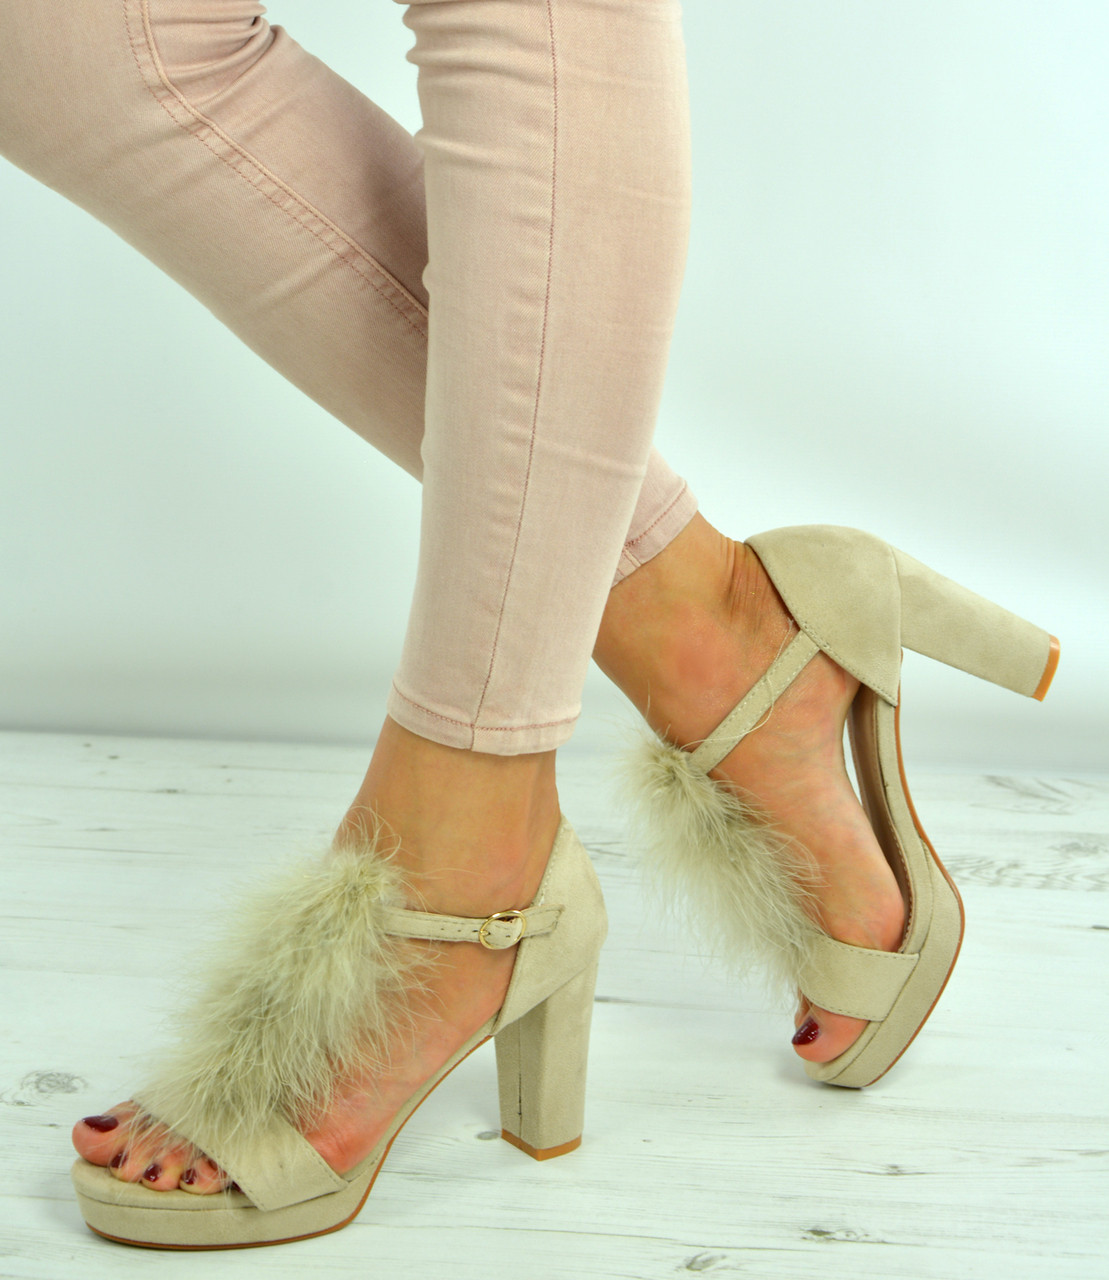 6140bf15055 New Womens Fur Block Heel Sandals Ladies Platforms Ankle Strap Shoes Size  Uk 3-8